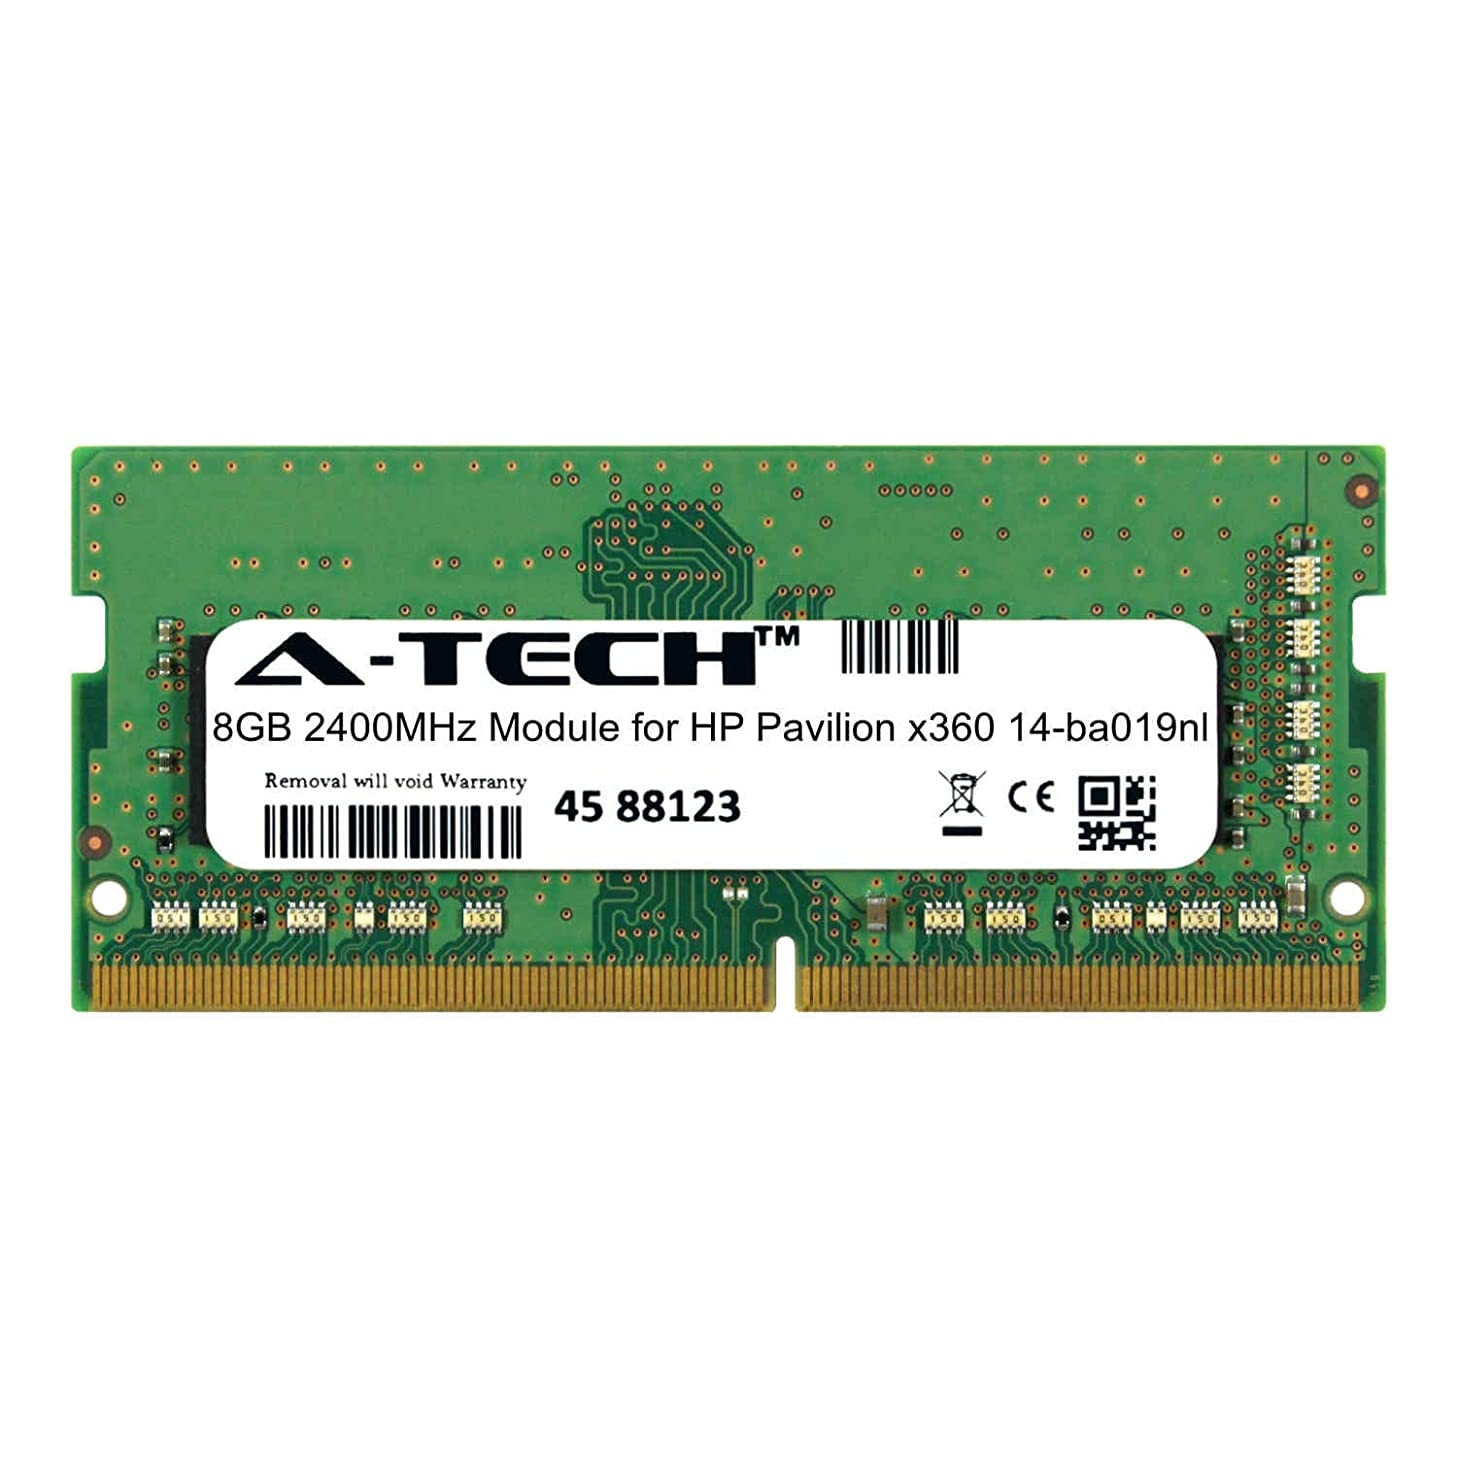 A-Tech 8GB Module for HP Pavilion x360 14-ba019nl Laptop & Notebook Compatible DDR4 2400Mhz Memory Ram (ATMS313034A25827X1)